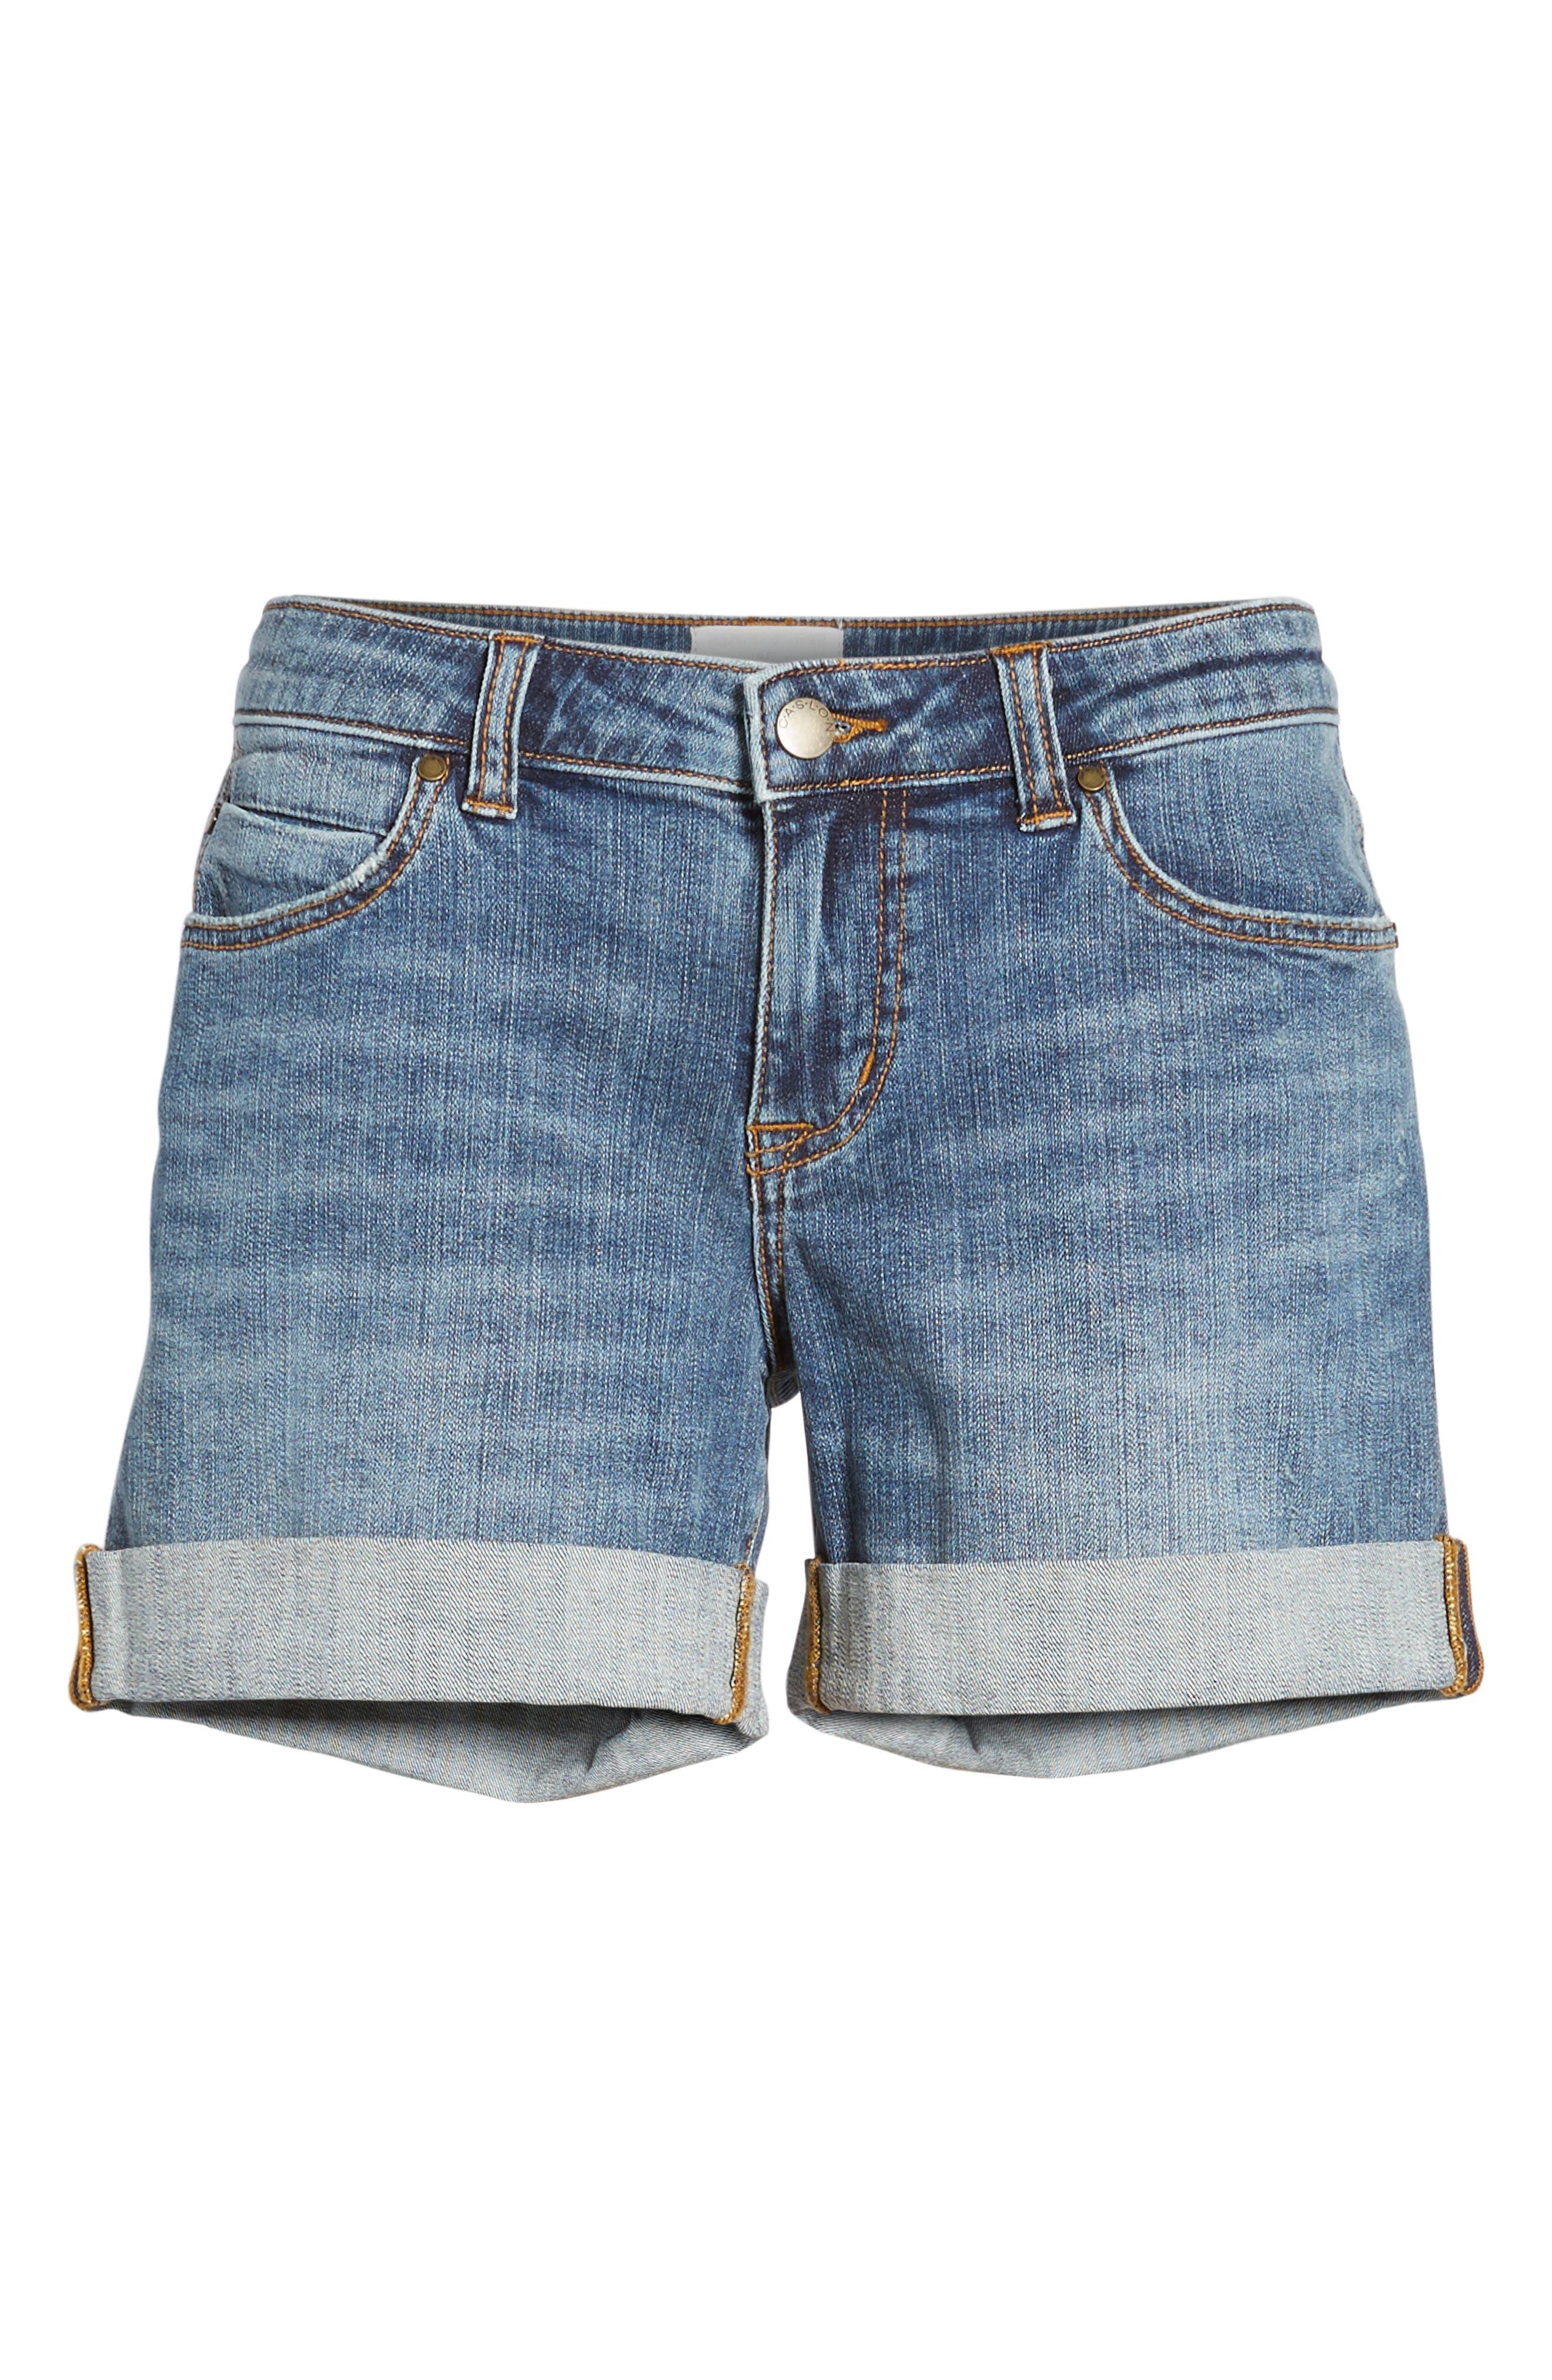 Rolled Denim Boyfriend Shorts,                             Alternate thumbnail 7, color,                             Medium Destruct